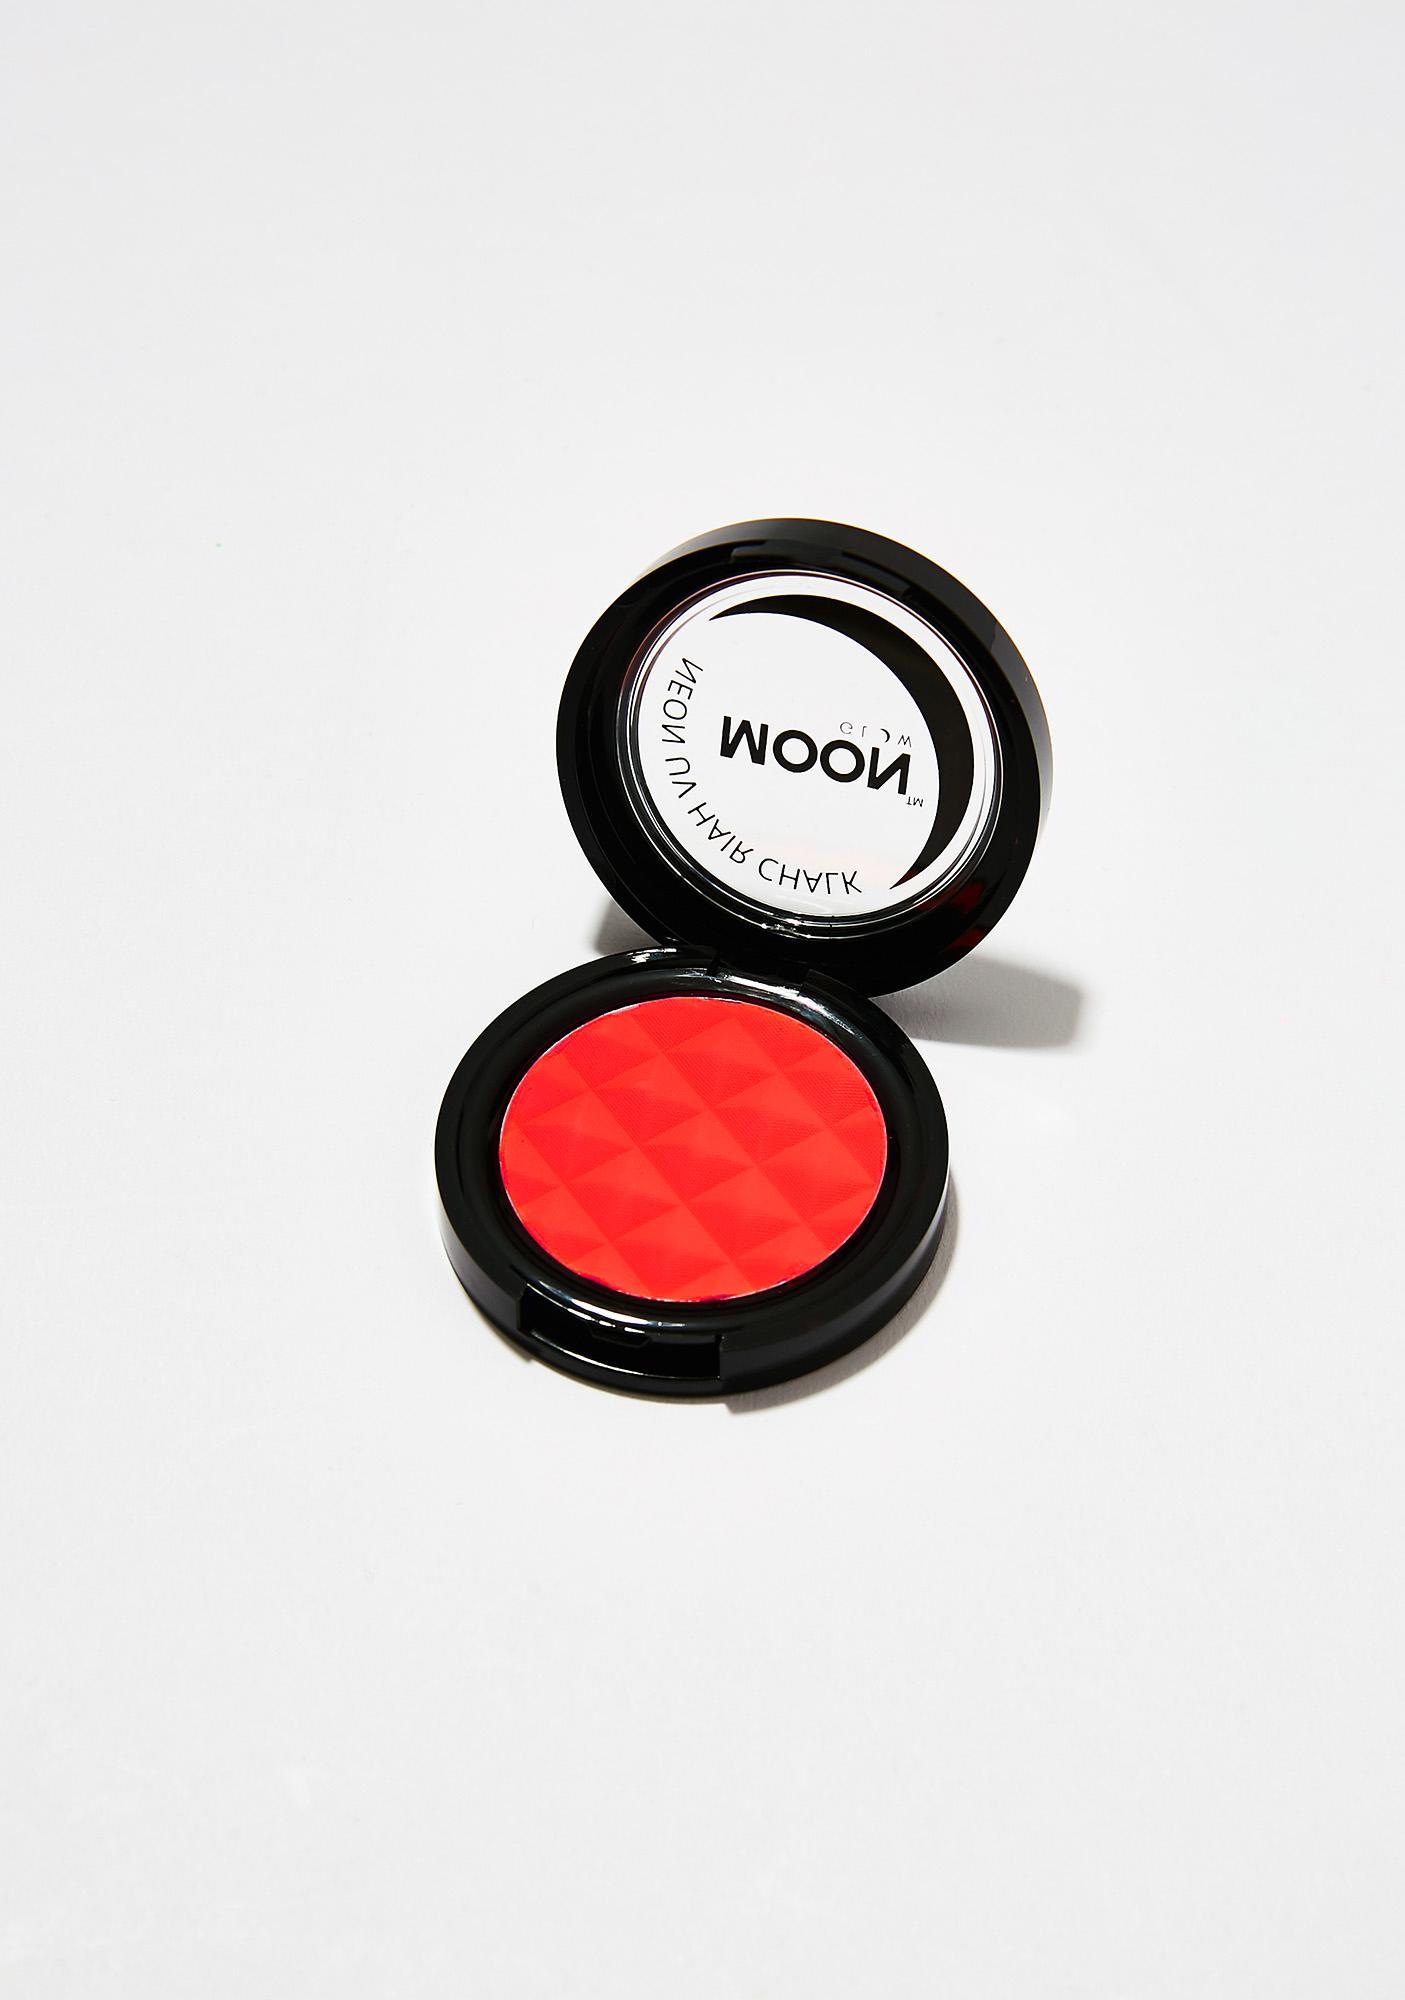 Moon Creations Neon Intense Red UV Hair Chalk